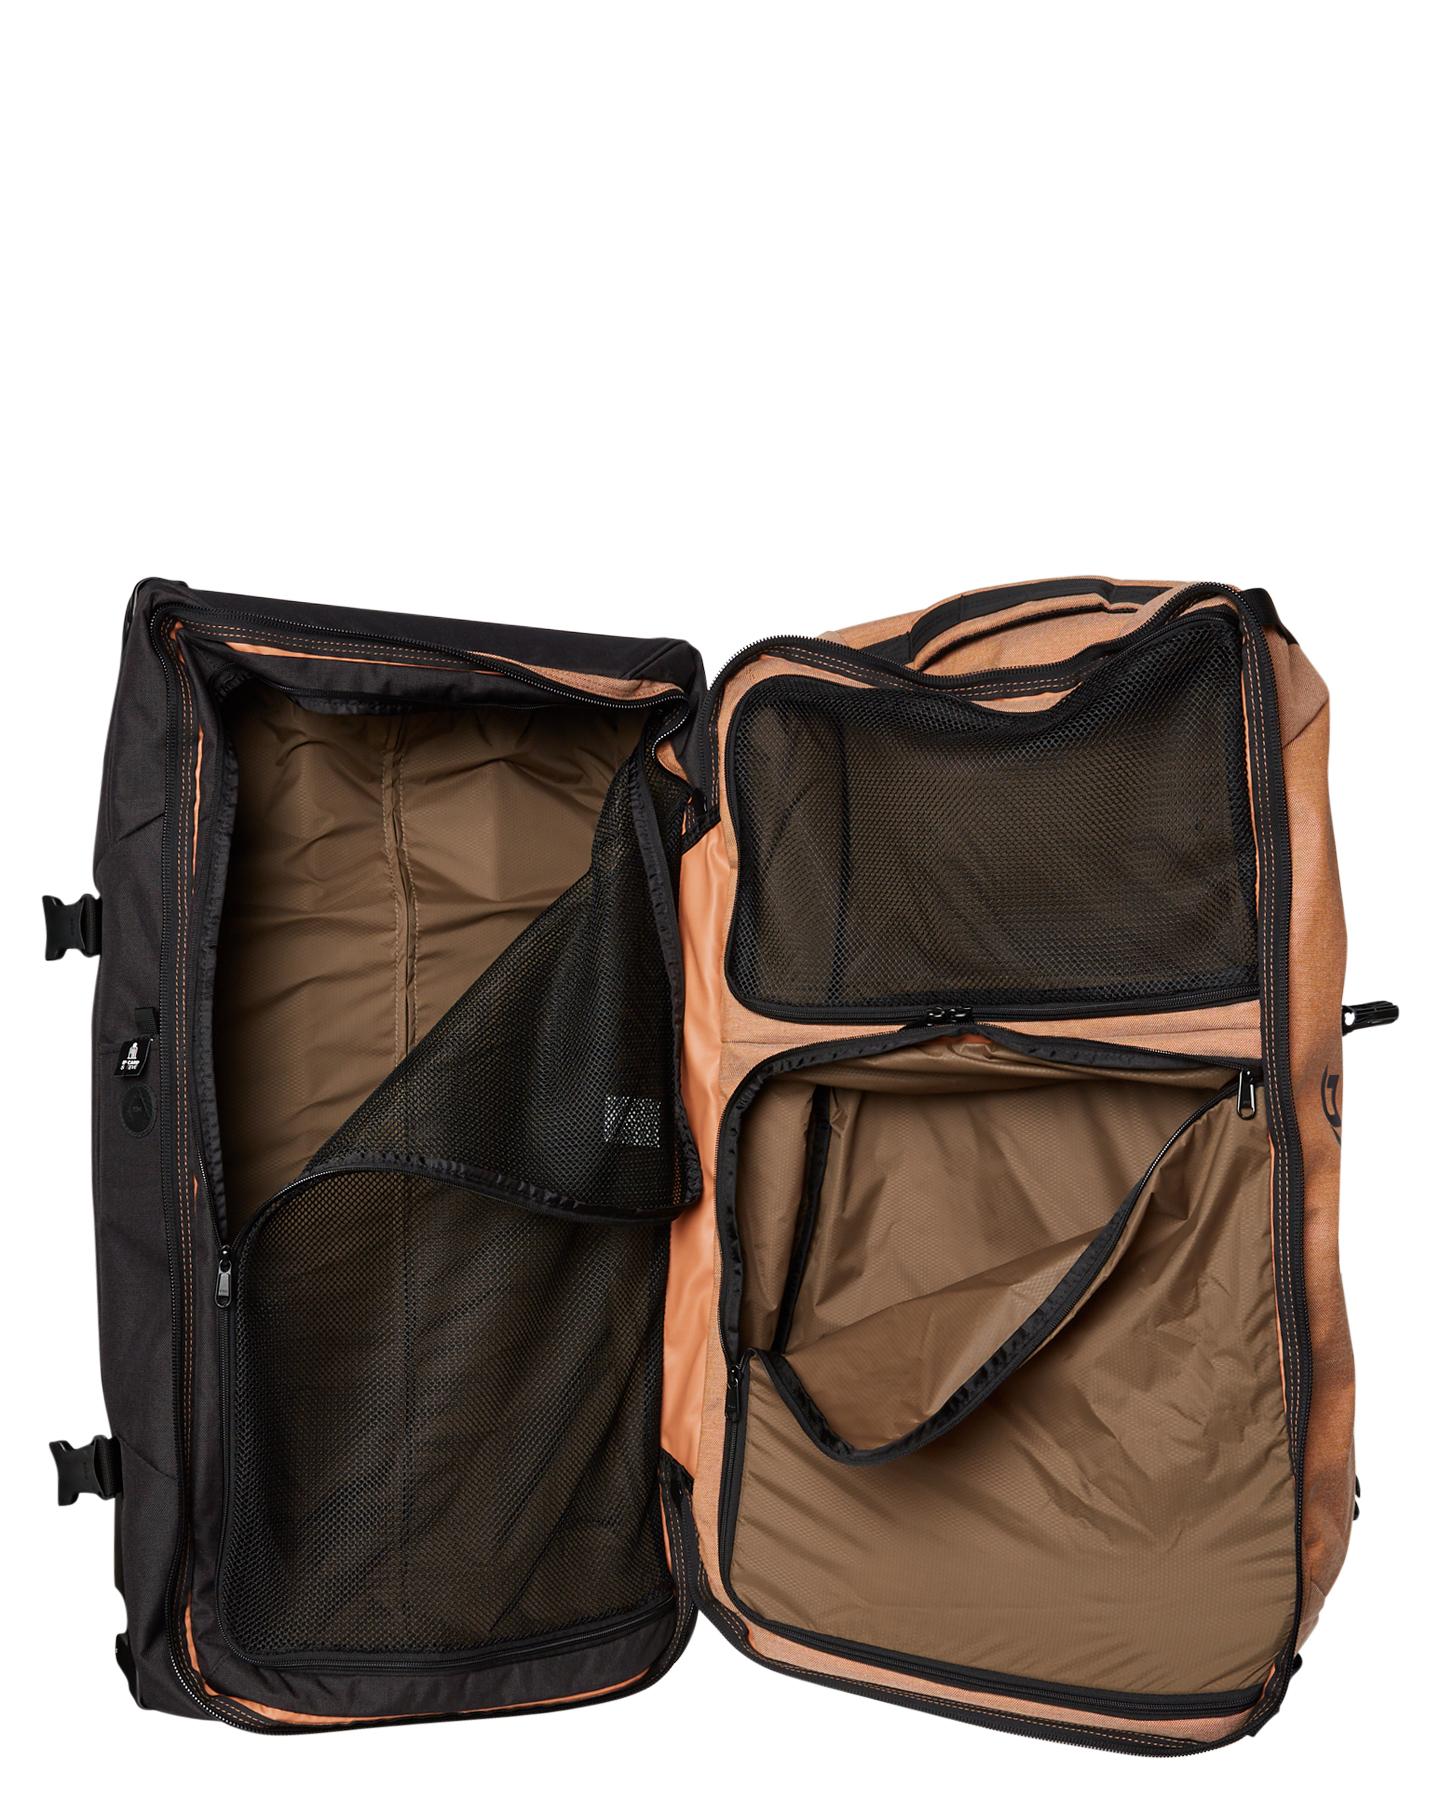 Ready 2 Roll Mens Accessories Dakine Bags Backpacks 10000783r2r